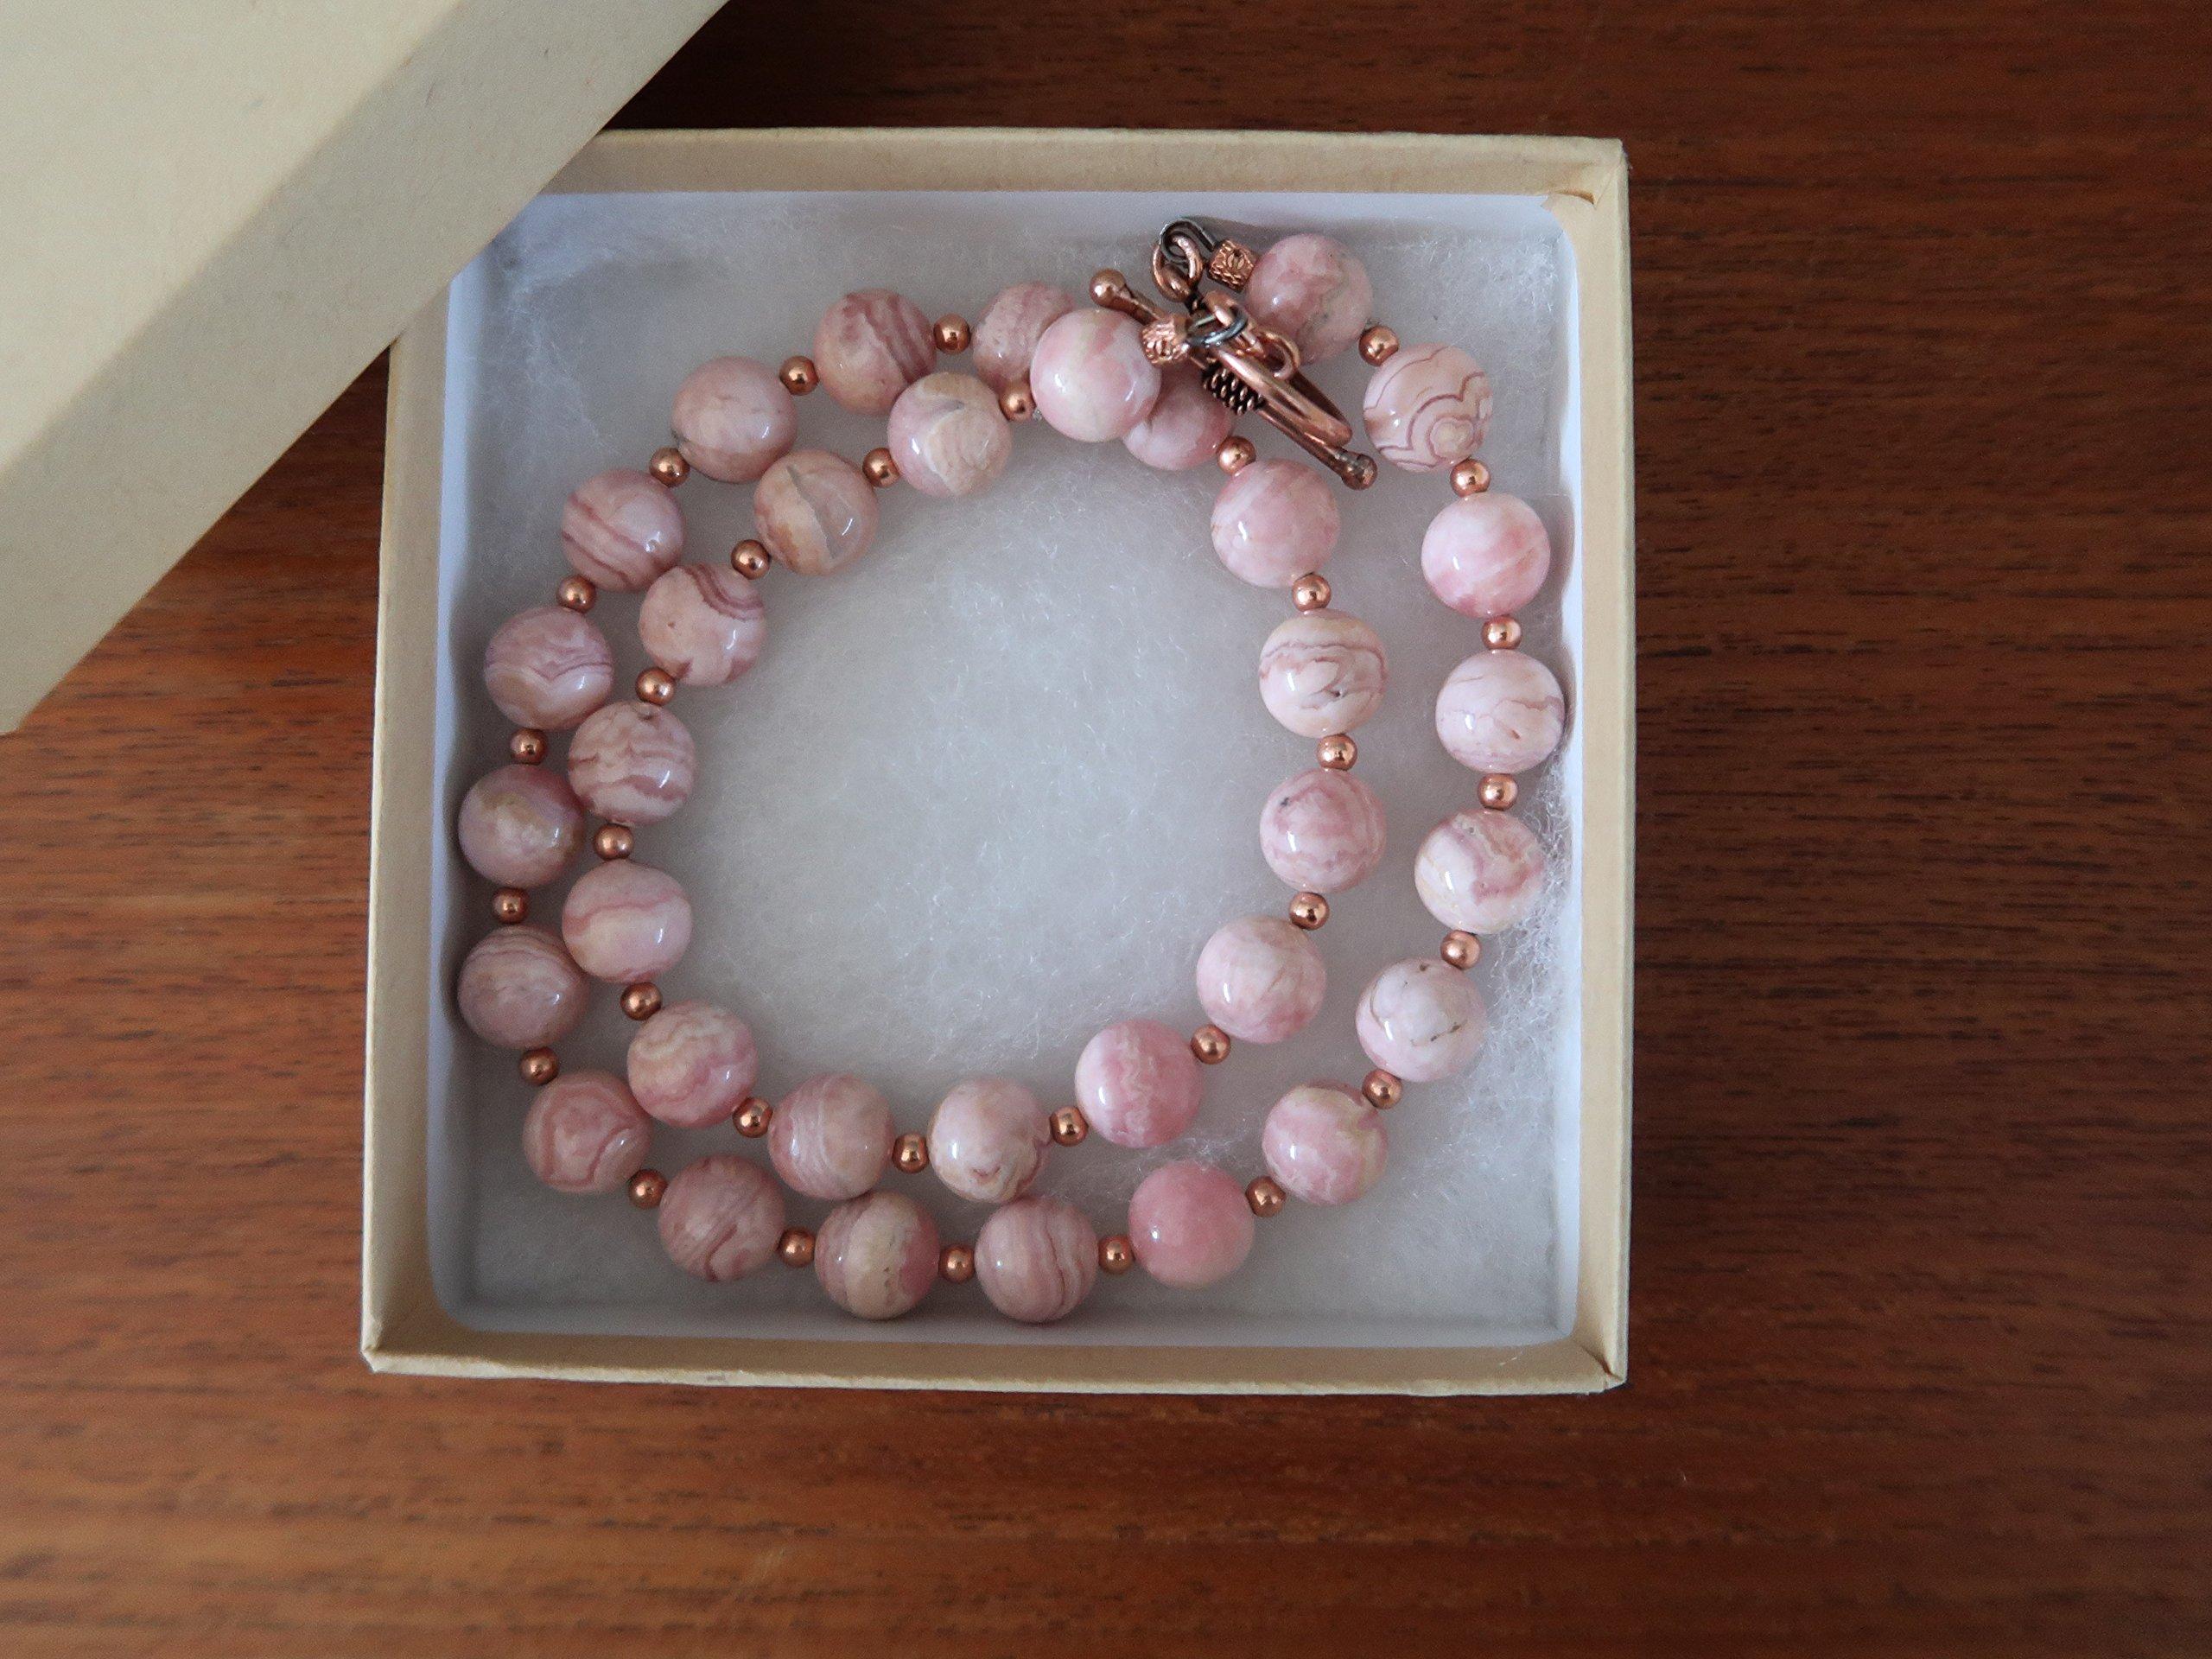 Satin Crystals Rhodochrosite Necklace Boutique Deluxe Pink Genuine Gemstone Round Beaded Copper B01 (17) by SatinCrystals (Image #2)